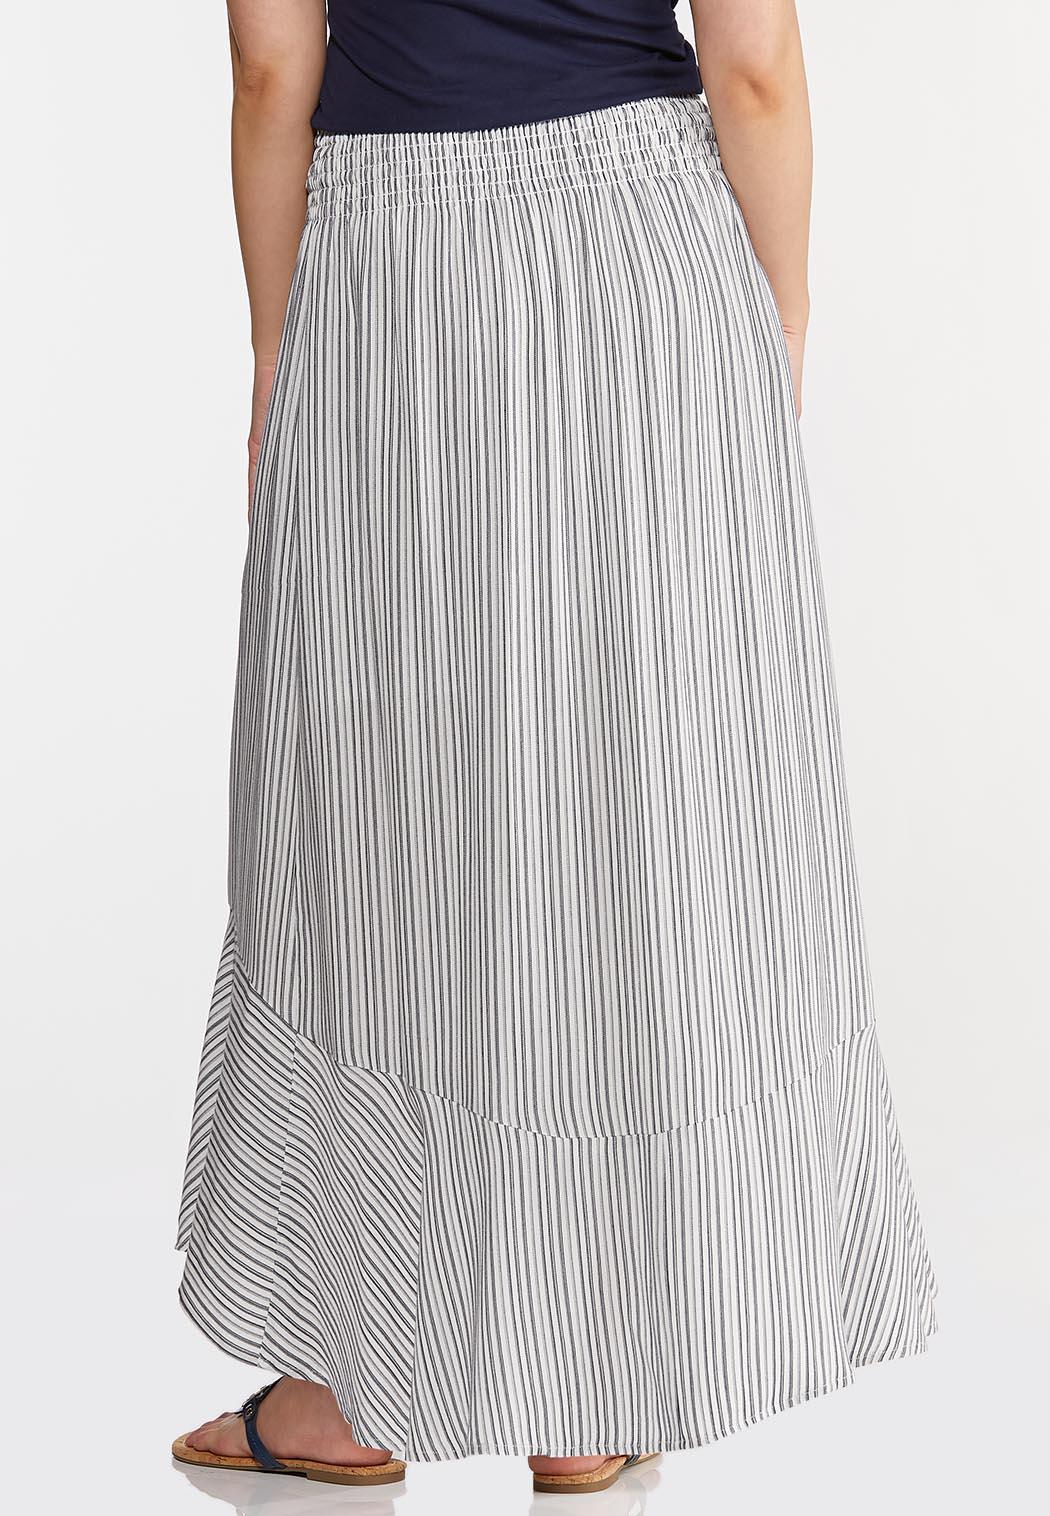 Plus Size Breezy Striped Maxi Skirt (Item #44287818)